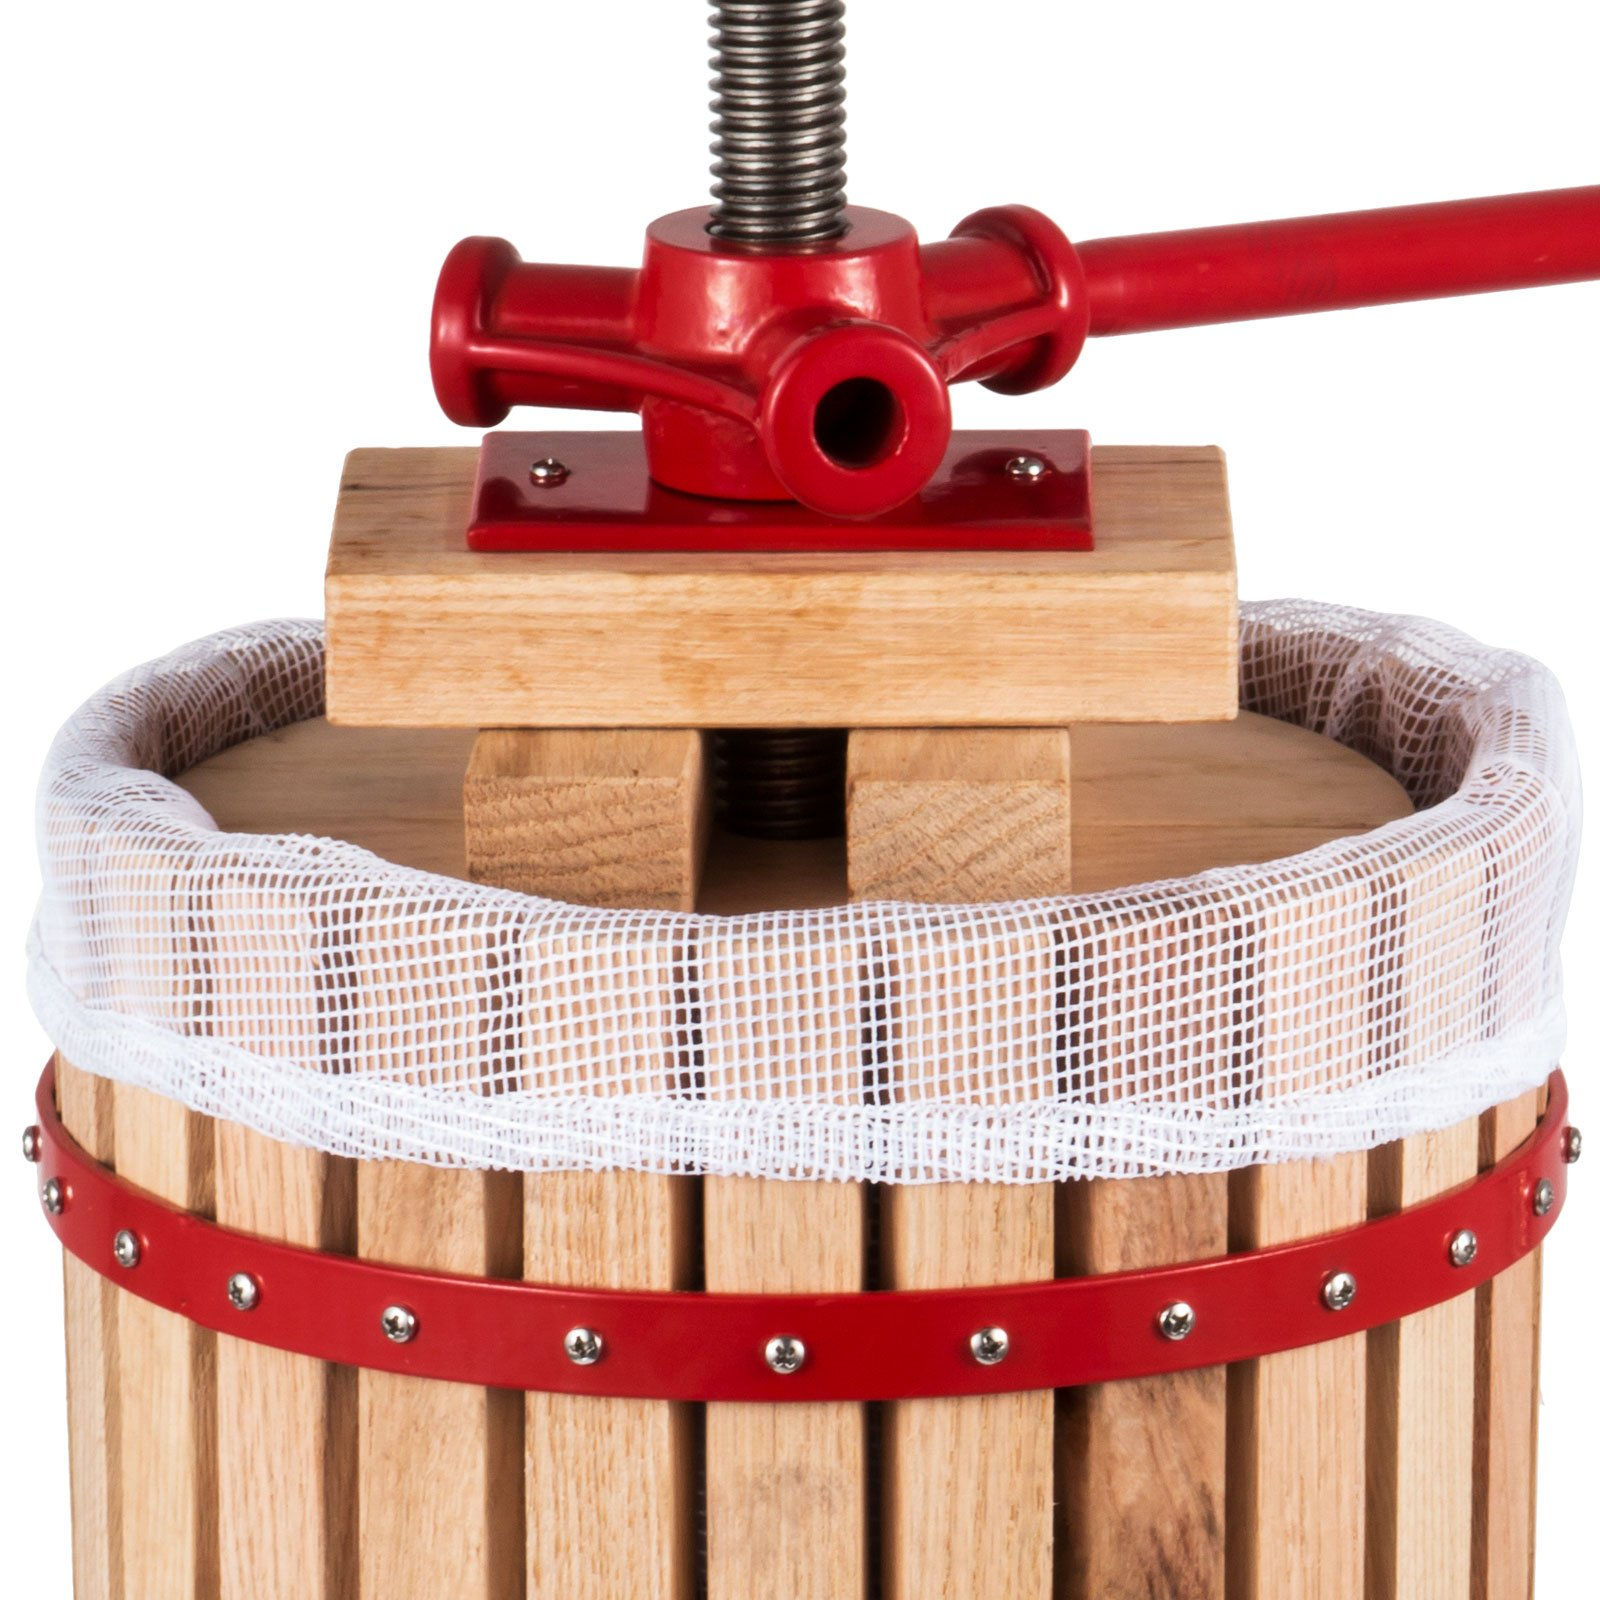 OrangeA 4.7 Gallon Fruit and Wine Press Solid Wood Basket Fruit and Wine Manual Press Press Cider Apple Grape Crusher Juice Maker (4.7 Gallon) by OrangeA (Image #6)